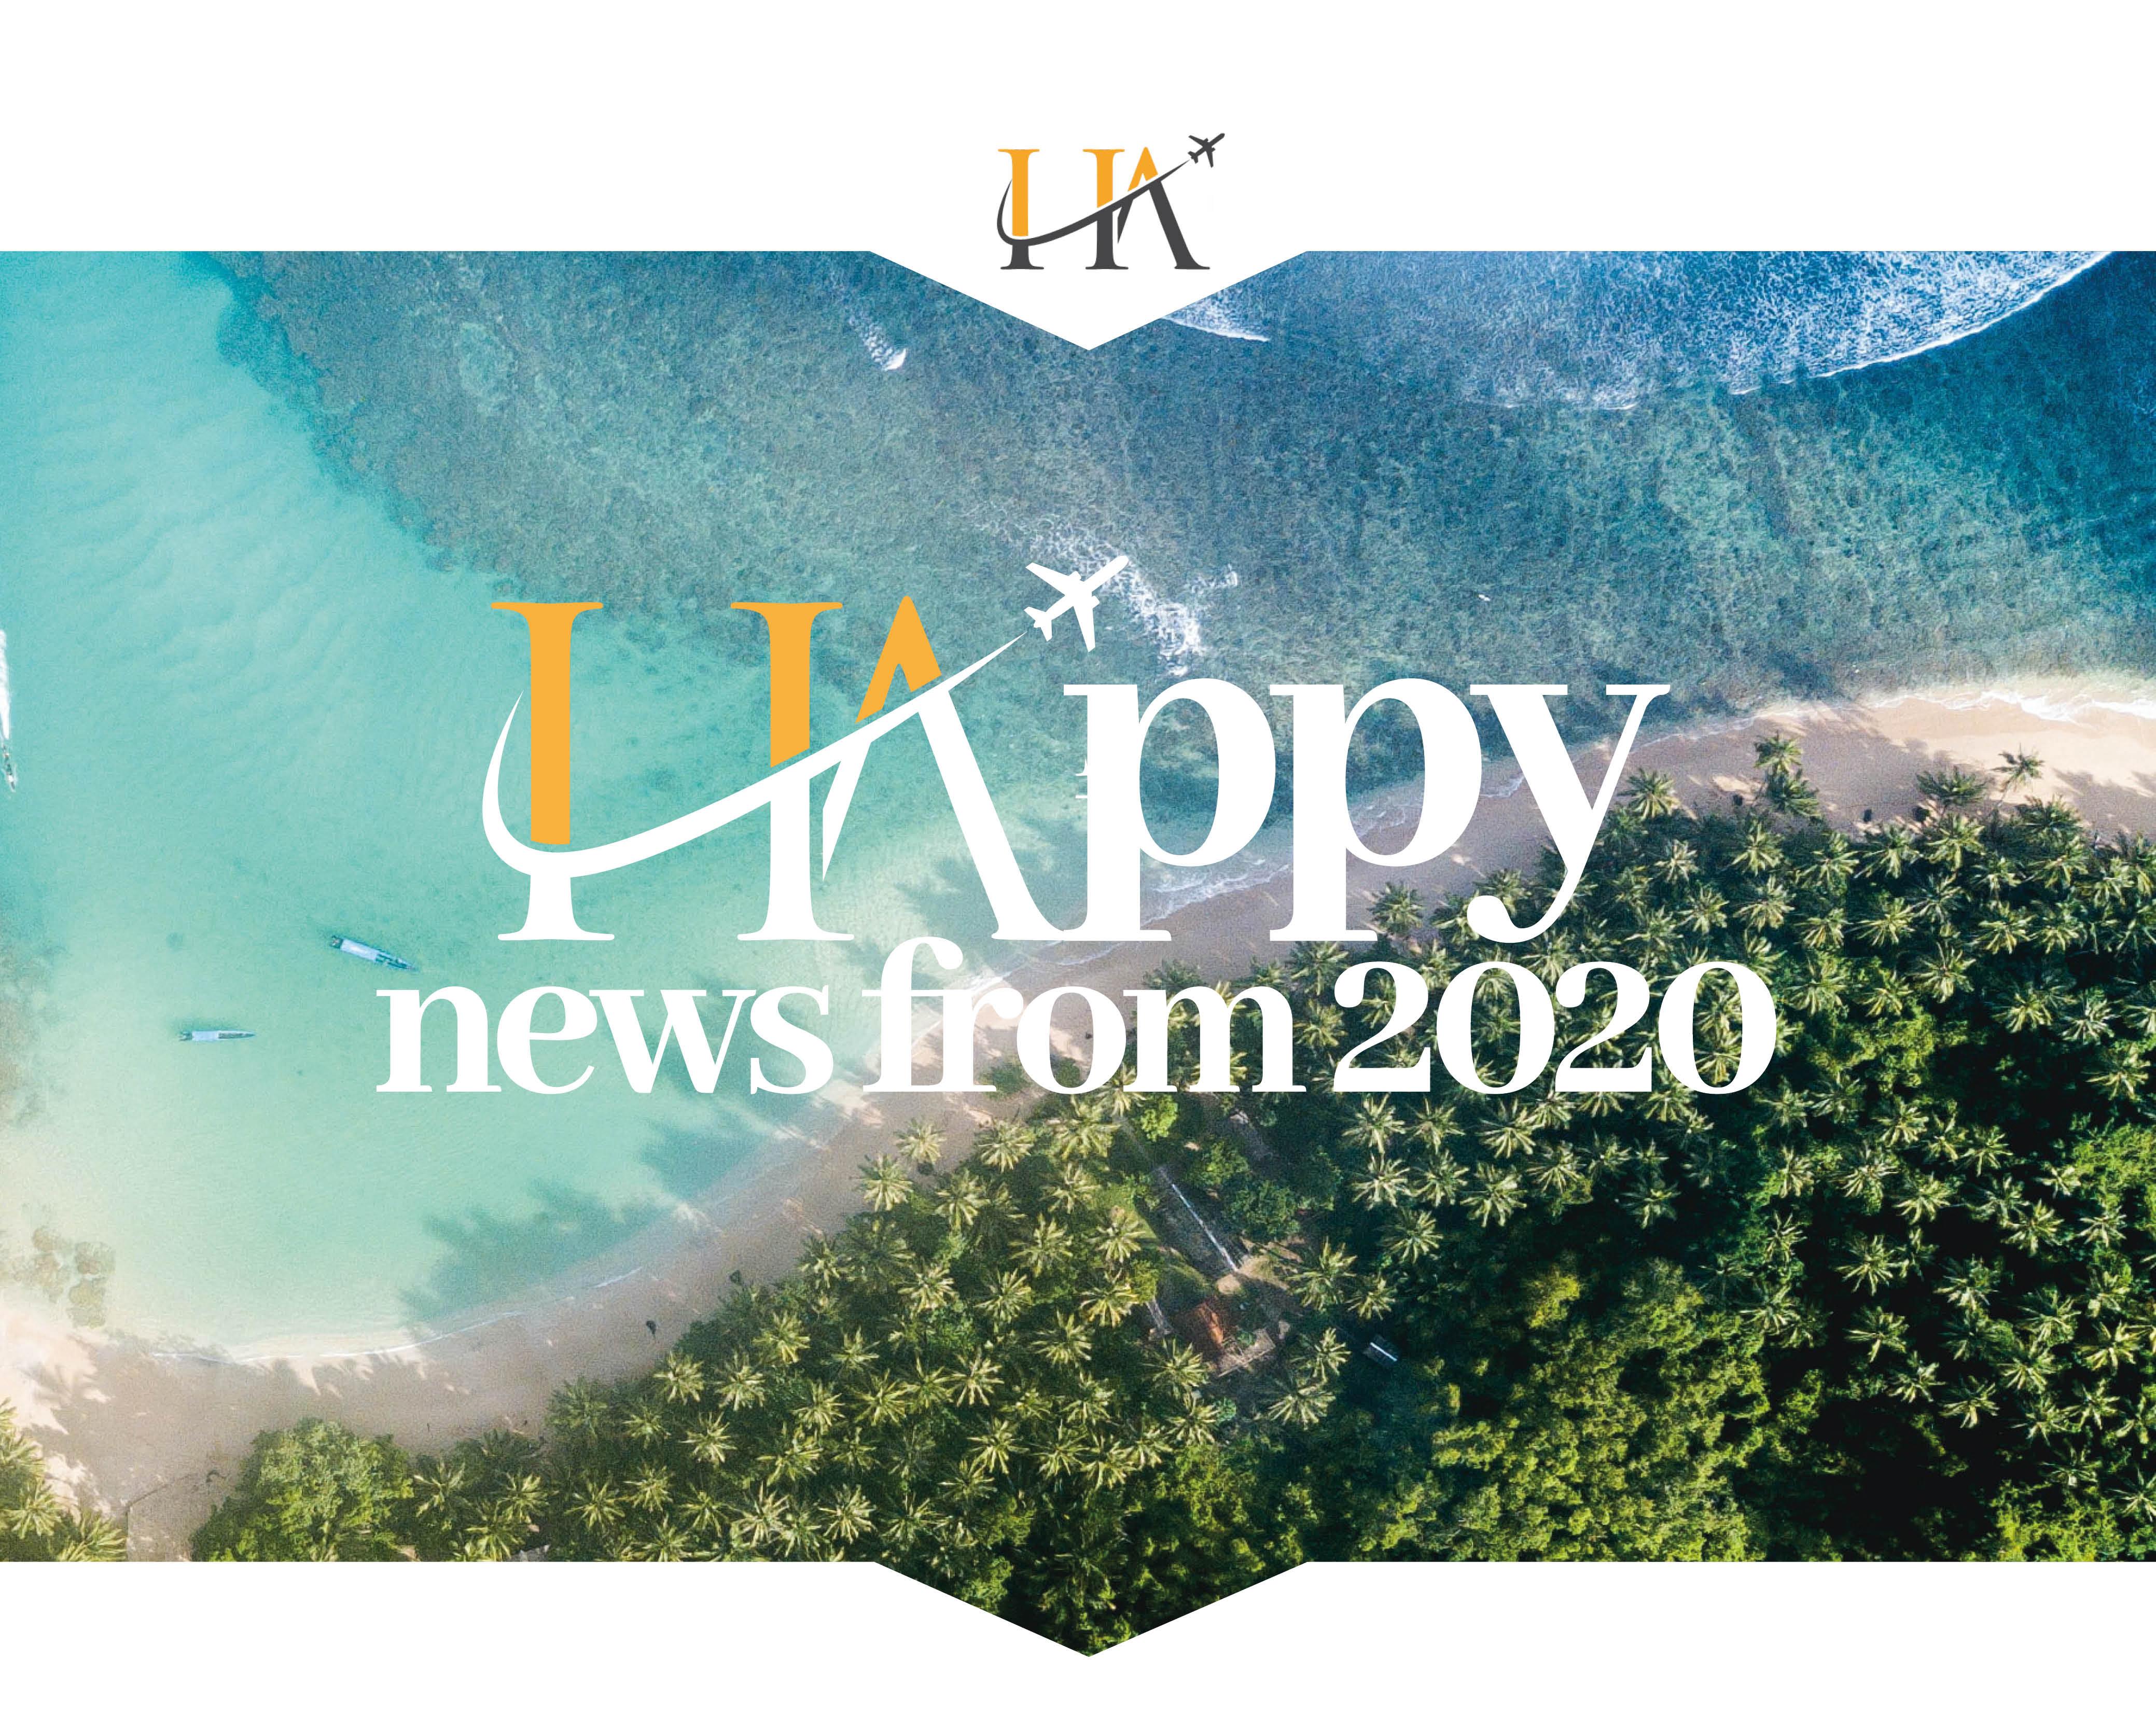 Happy 2020 news_header build